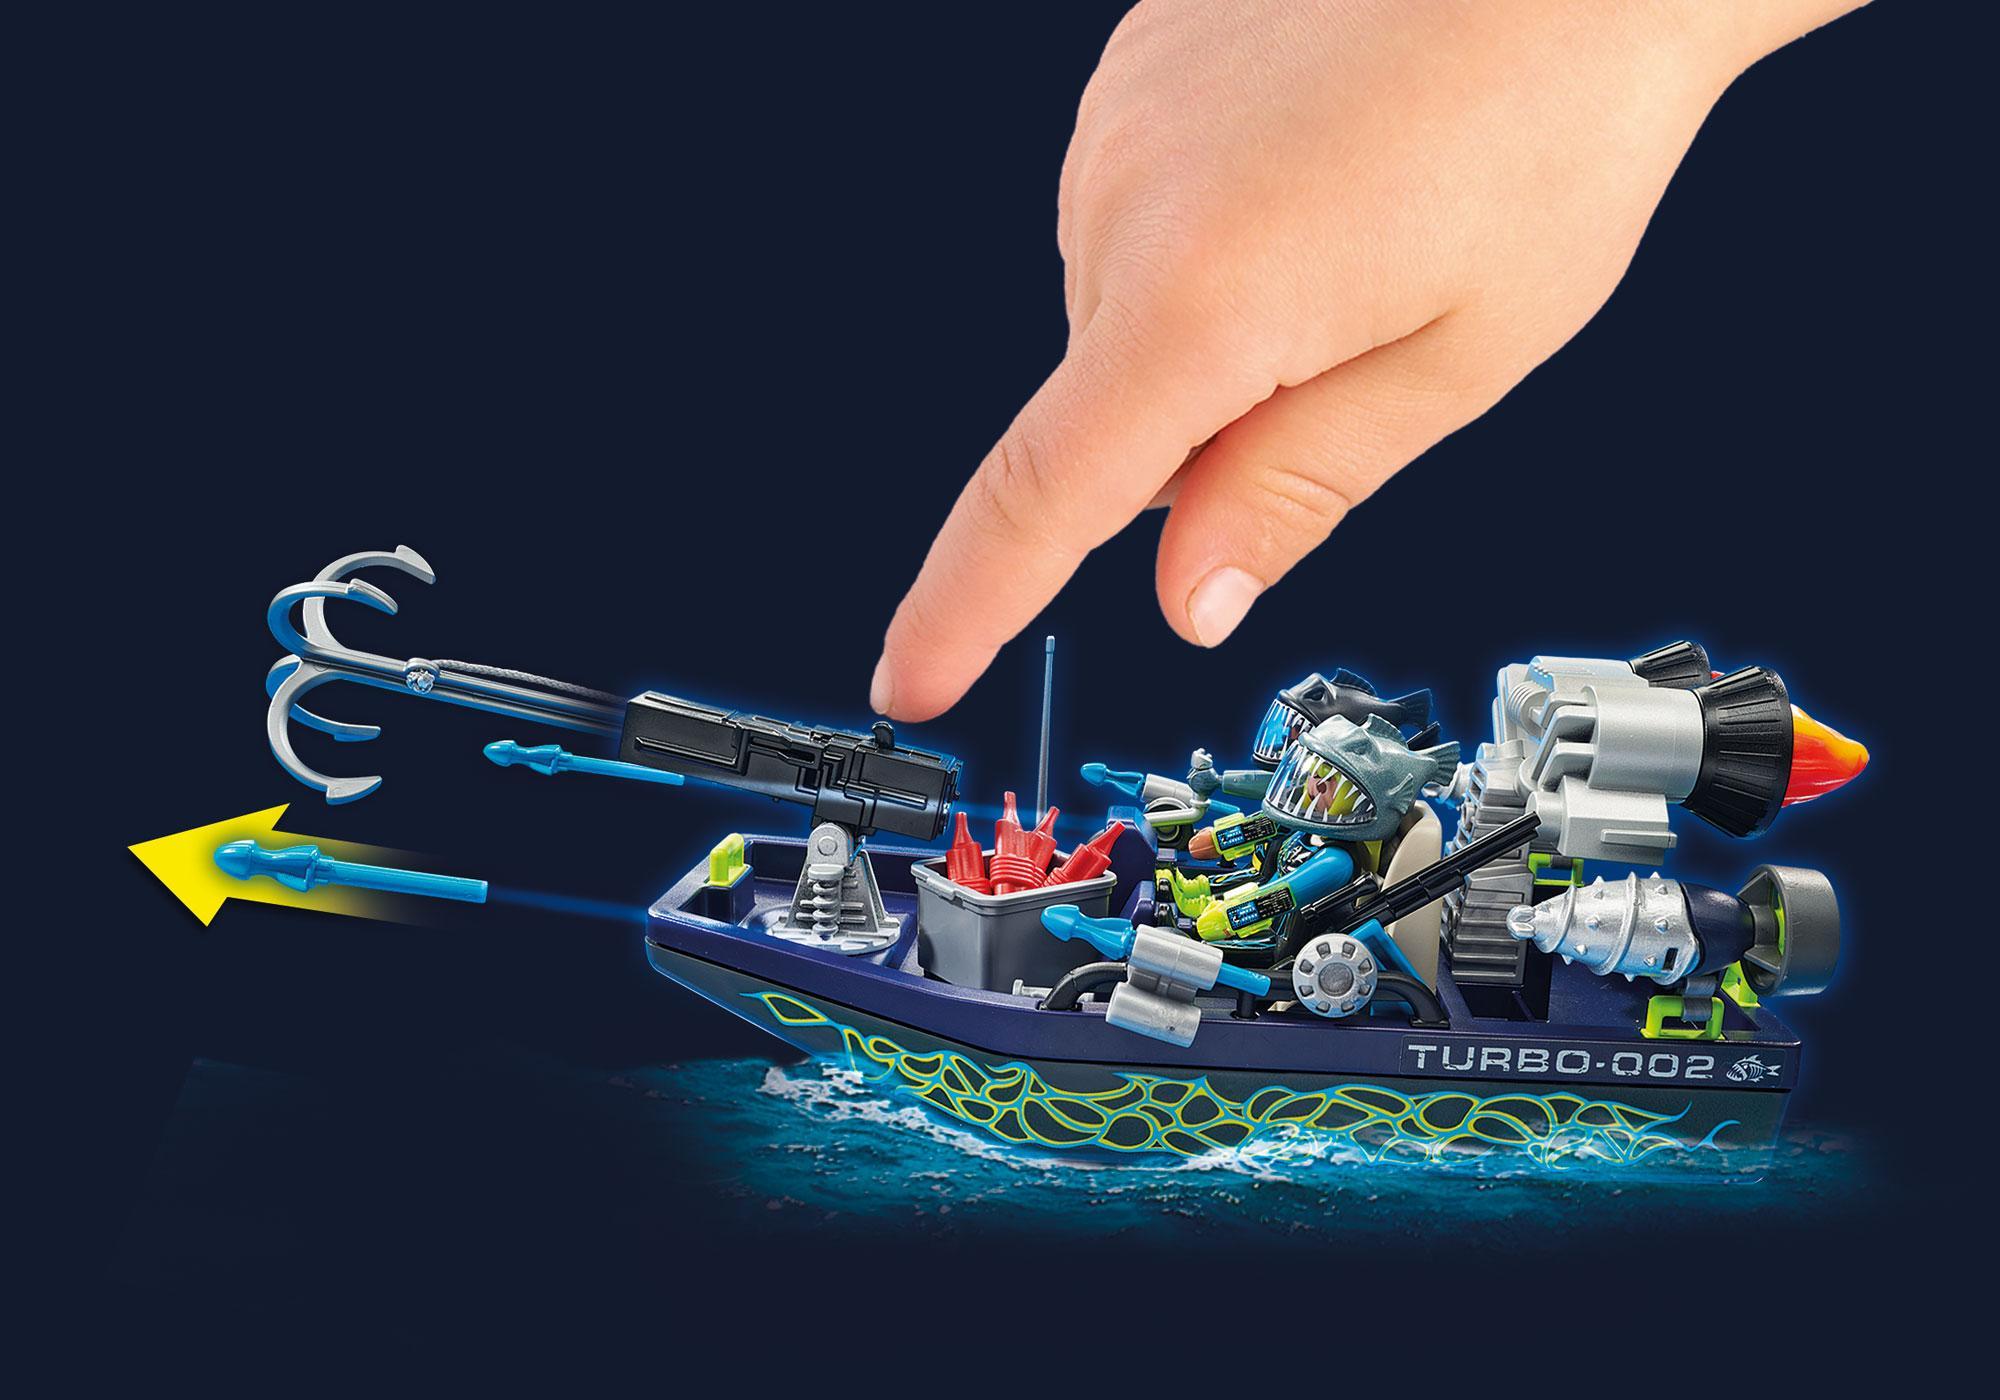 http://media.playmobil.com/i/playmobil/70006_product_extra1/TEAM S.H.A.R.K. Harpoon Craft